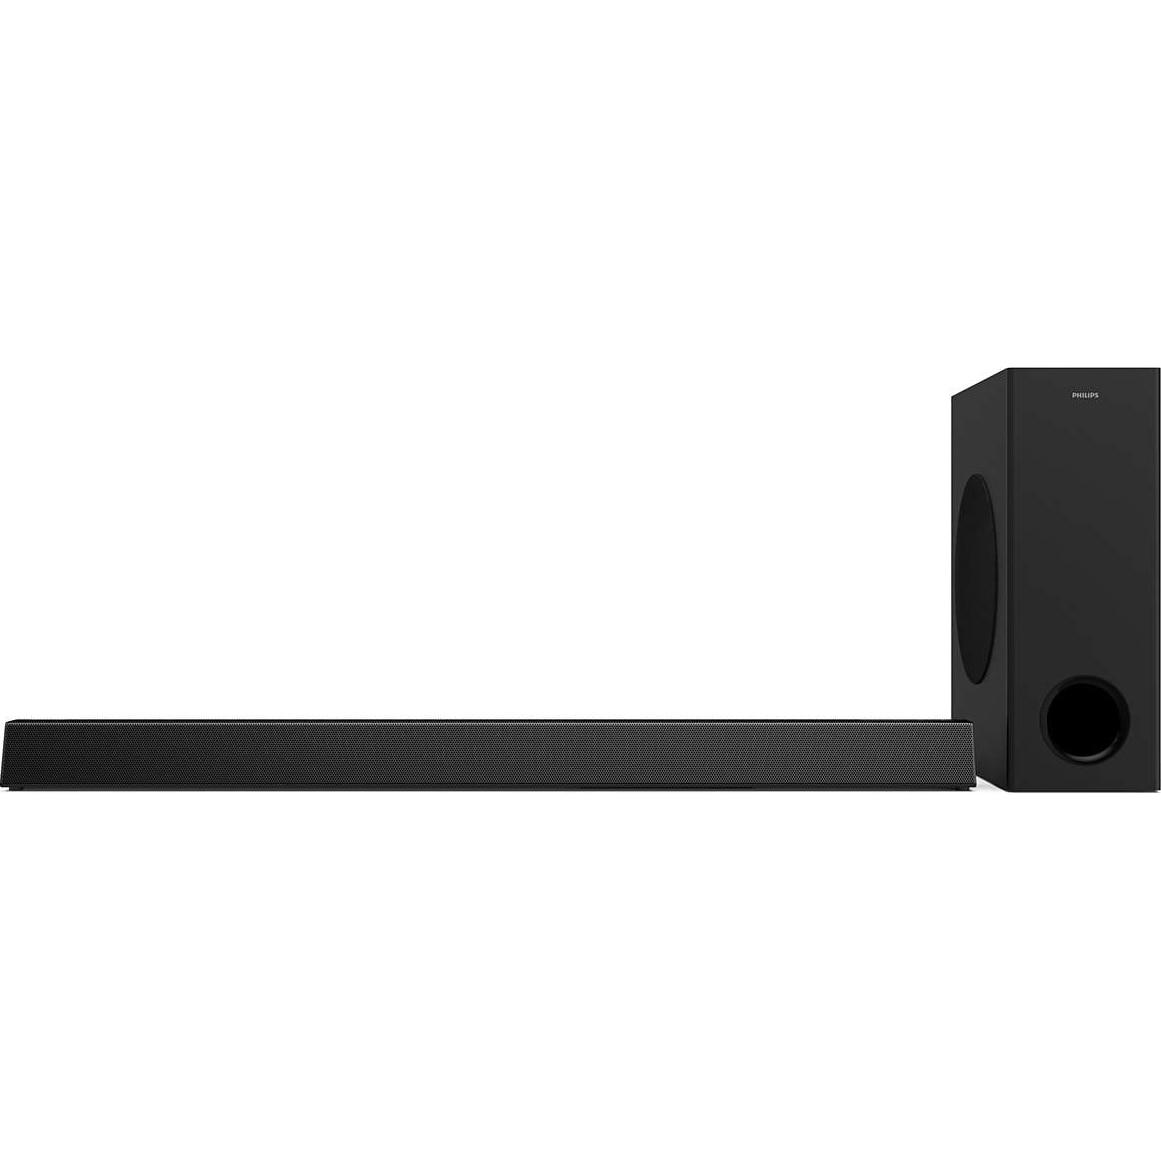 Fotografie Soundbar Philips HTL3320/10, Subwoofer wireless 3.1 CH, Dolby Digital, HDMI ARC, 300 W, Bluetooth, USB, Negru